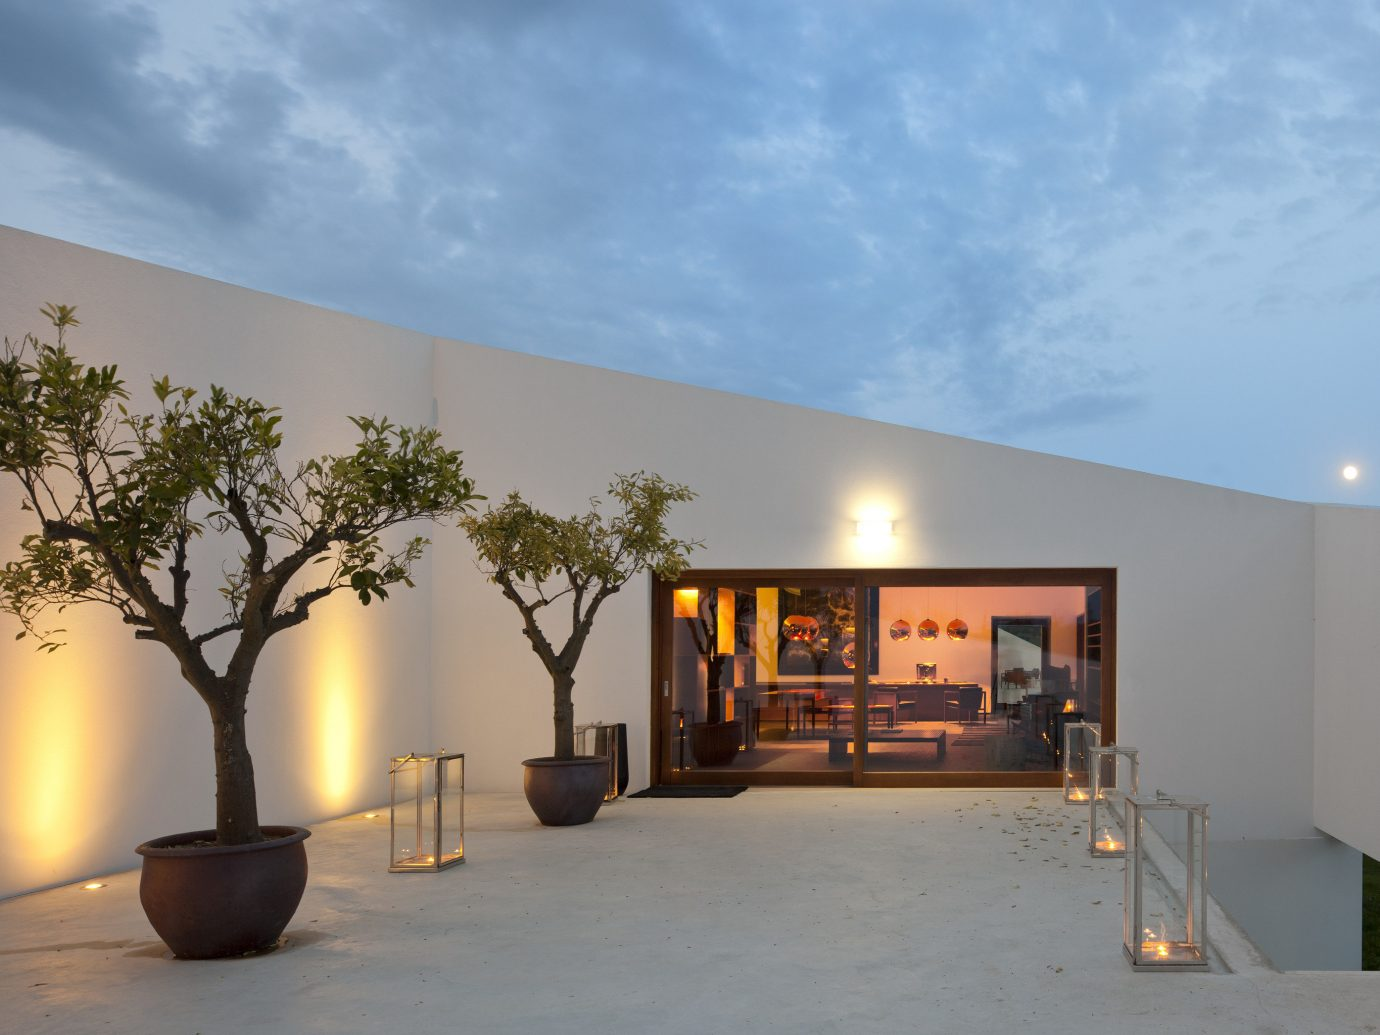 Hotels Trip Ideas sky Architecture house home real estate facade interior design